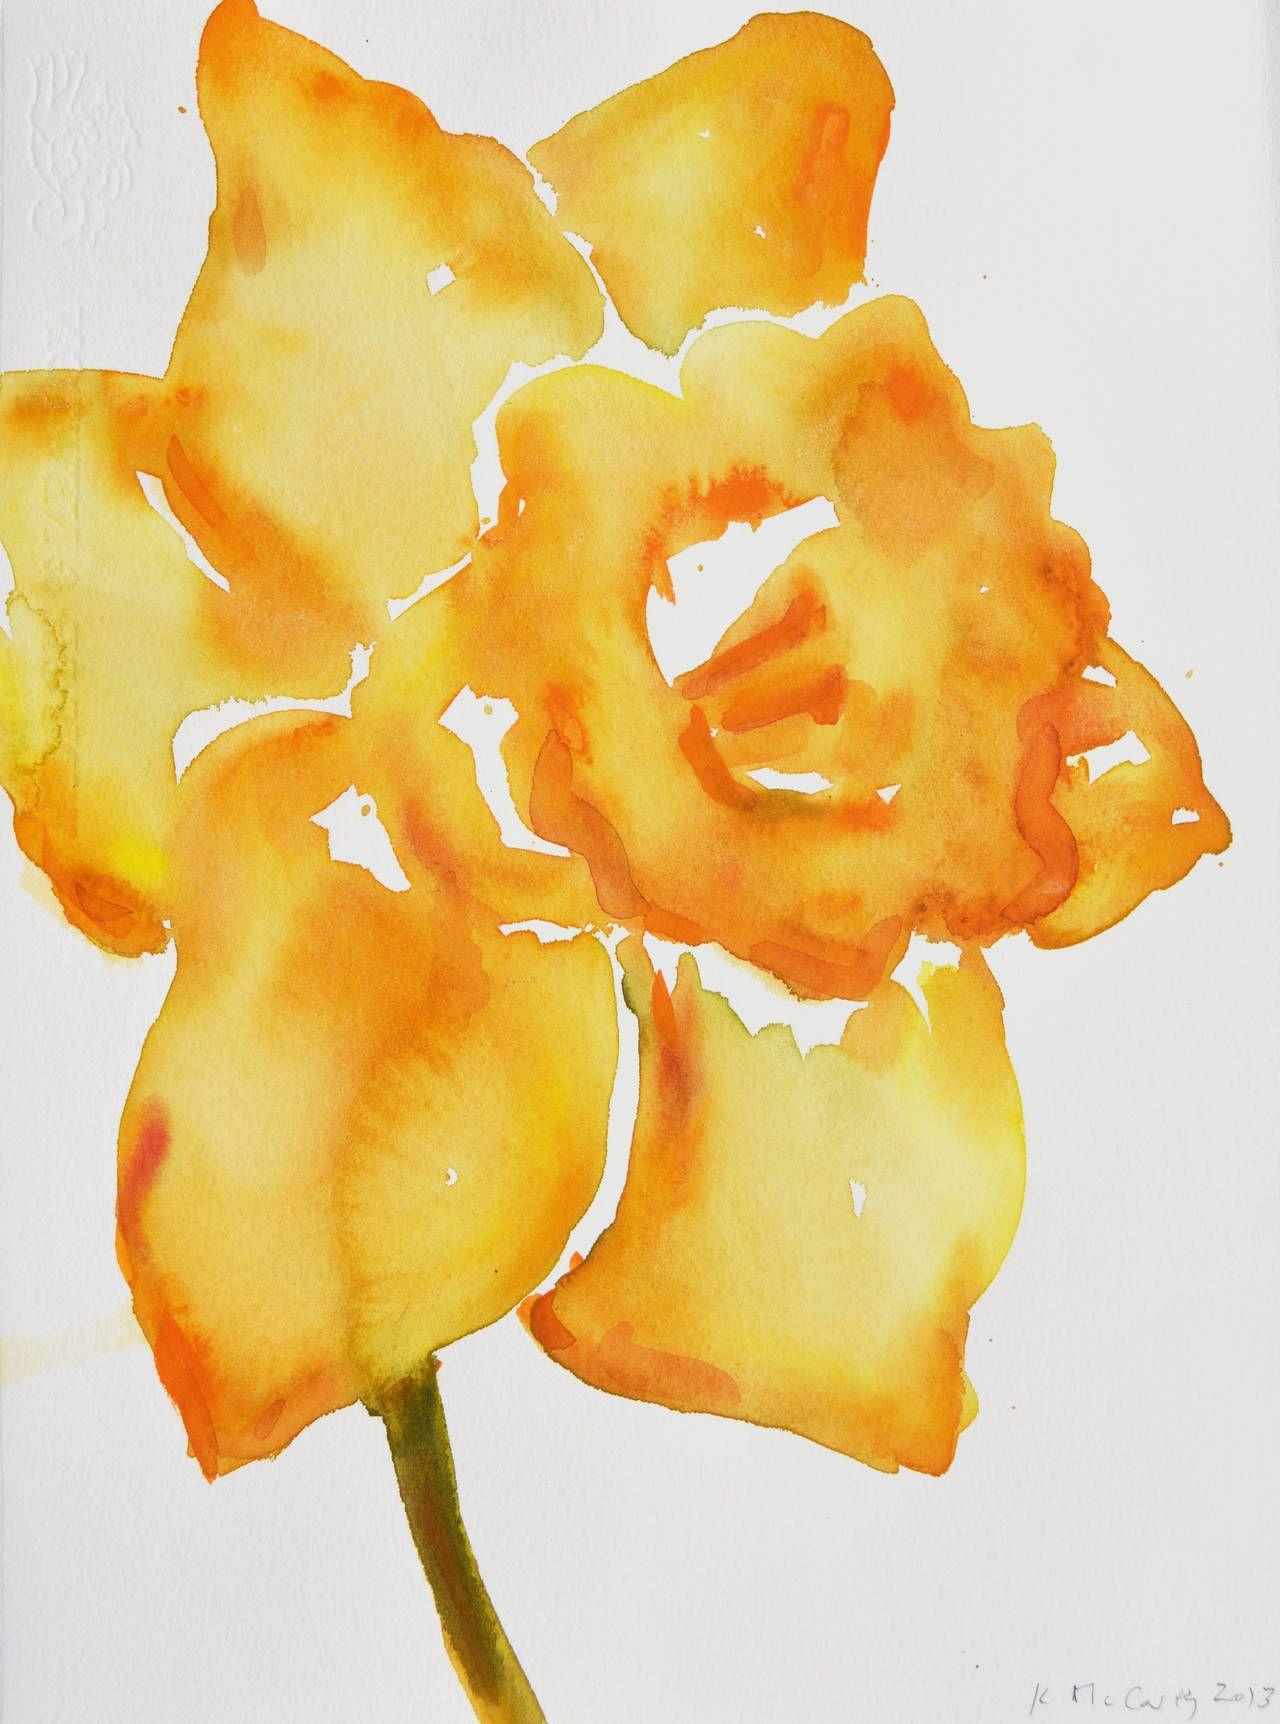 Kim mccarty daffodil life drawing daffodils and art drawings